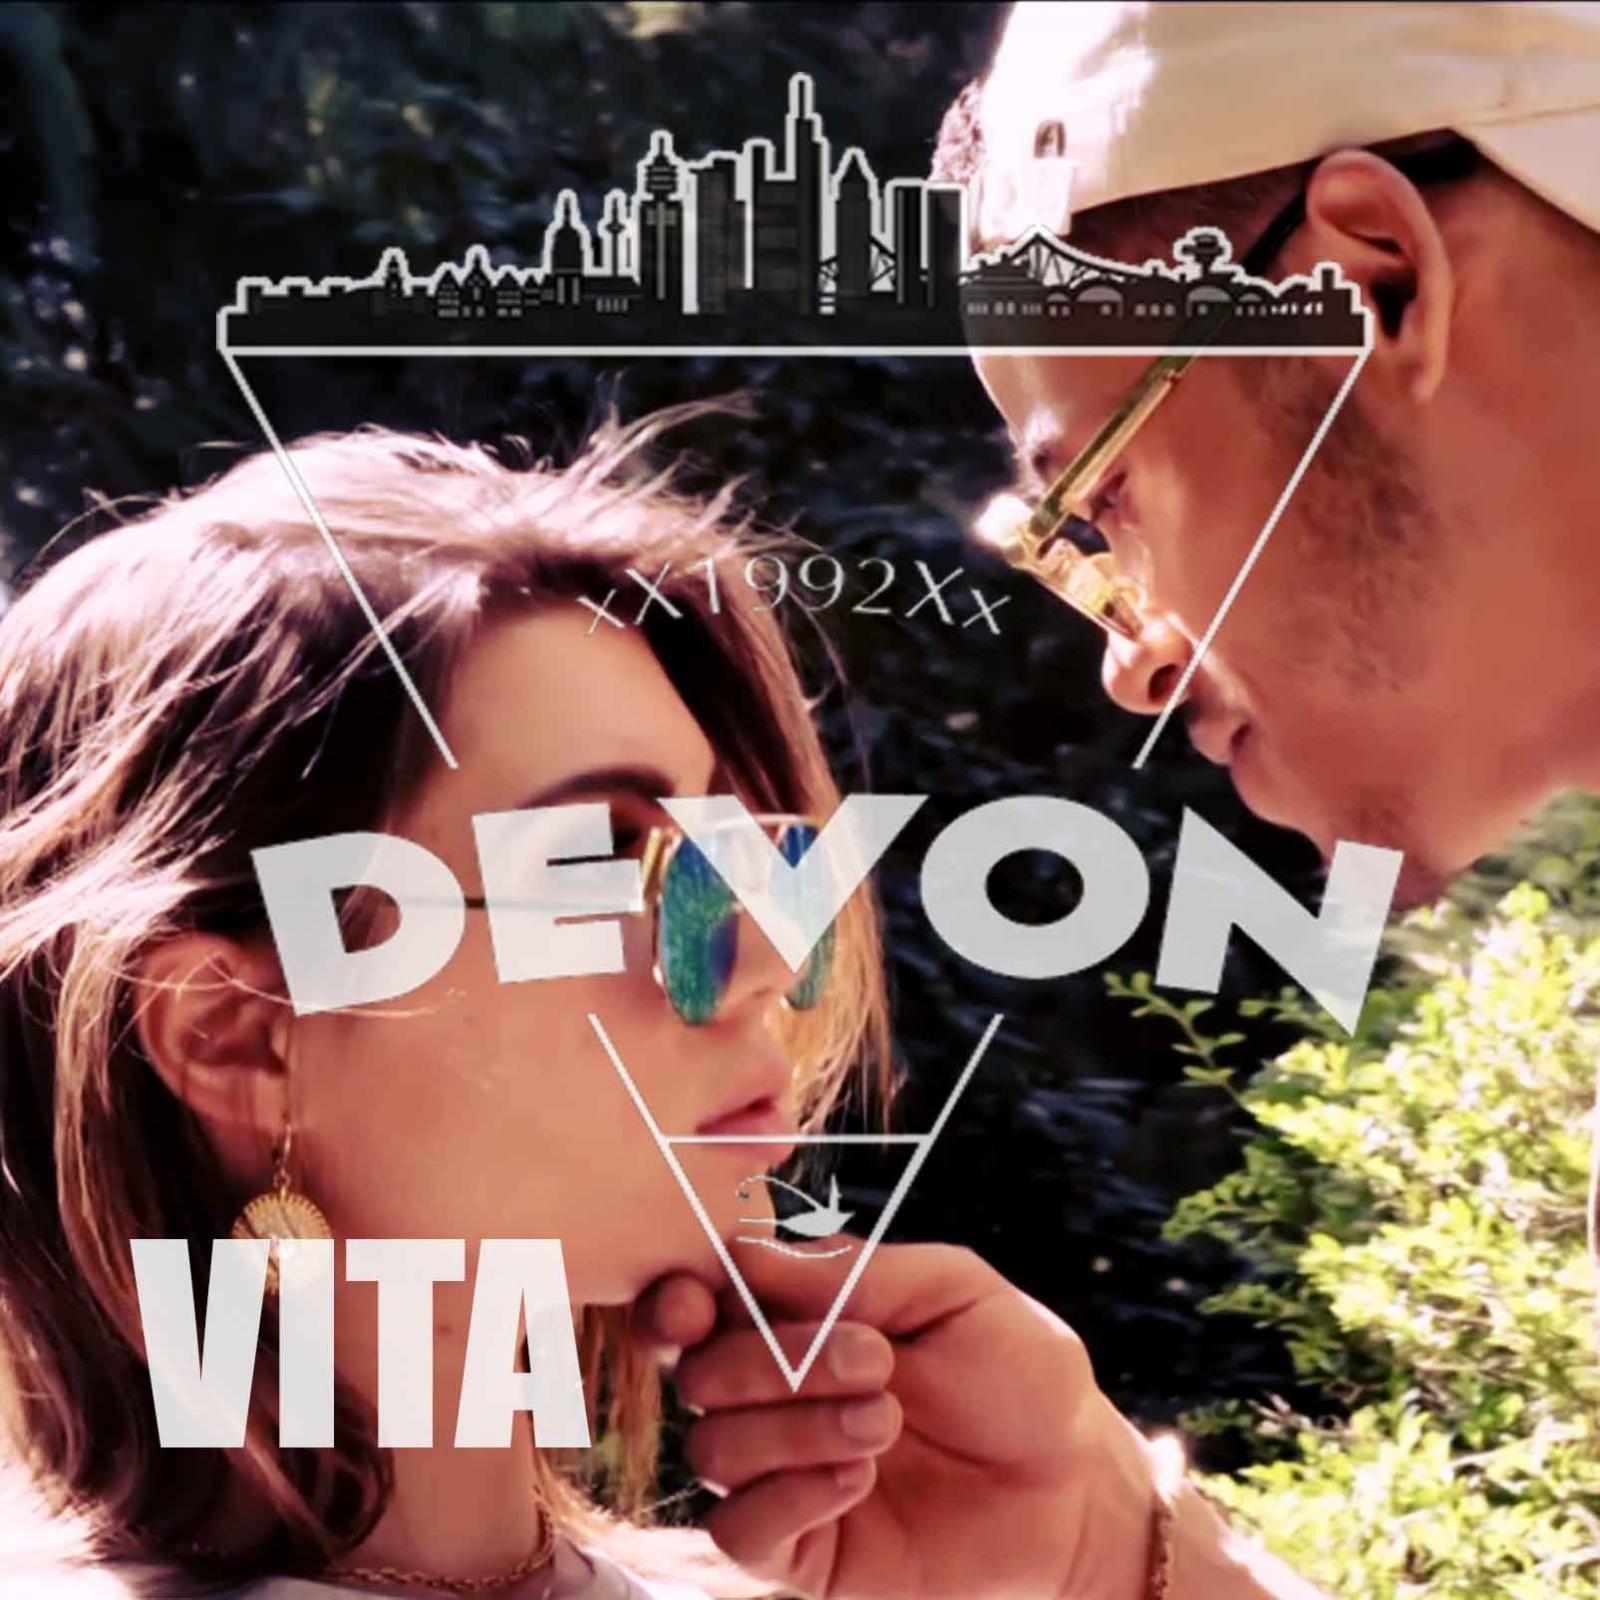 Upcoming: Devon - Vita